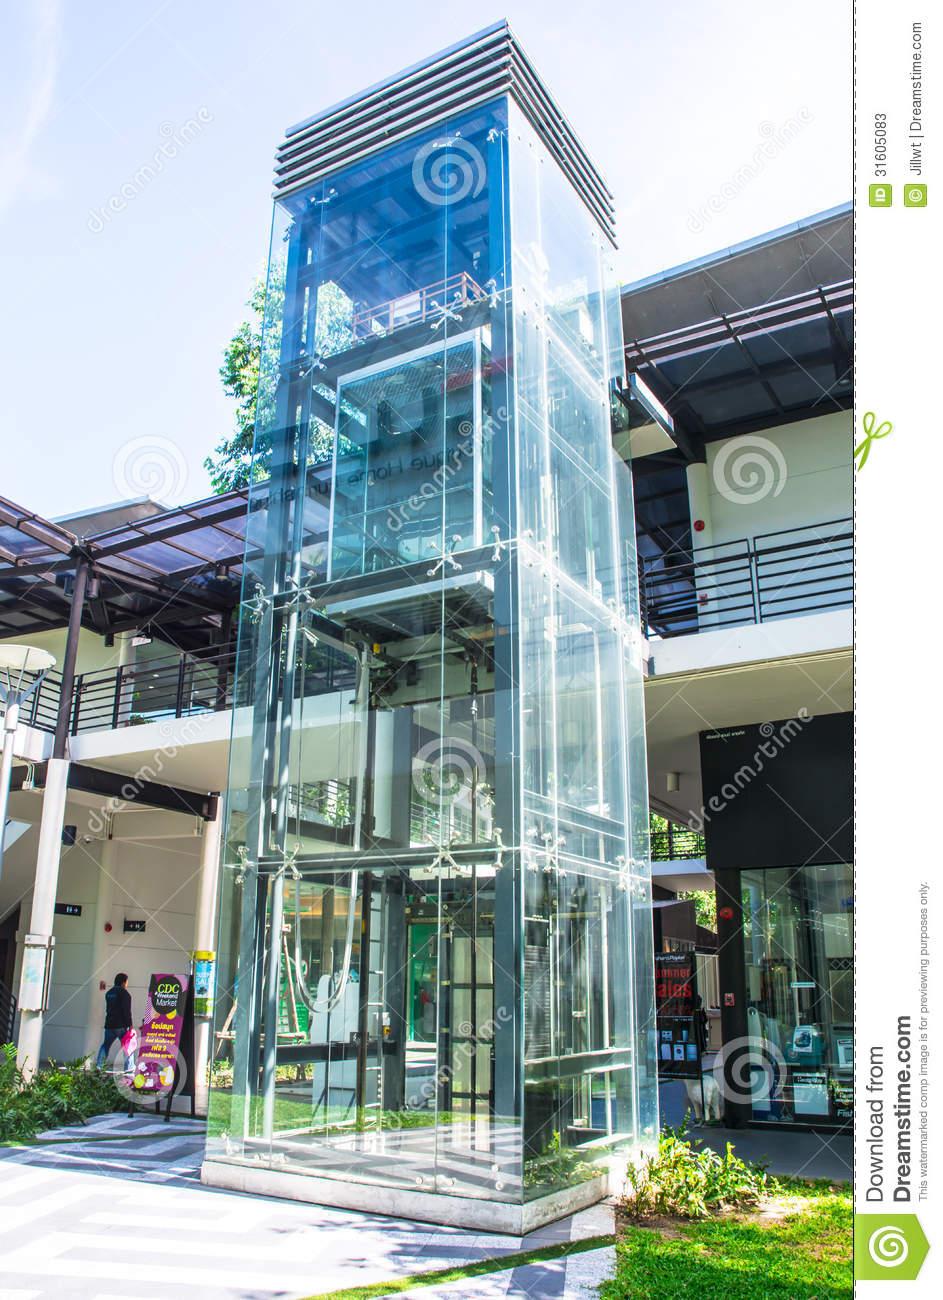 design-modern-elevator-glass-bangkok-thailand-april-construction-31605083.jpg